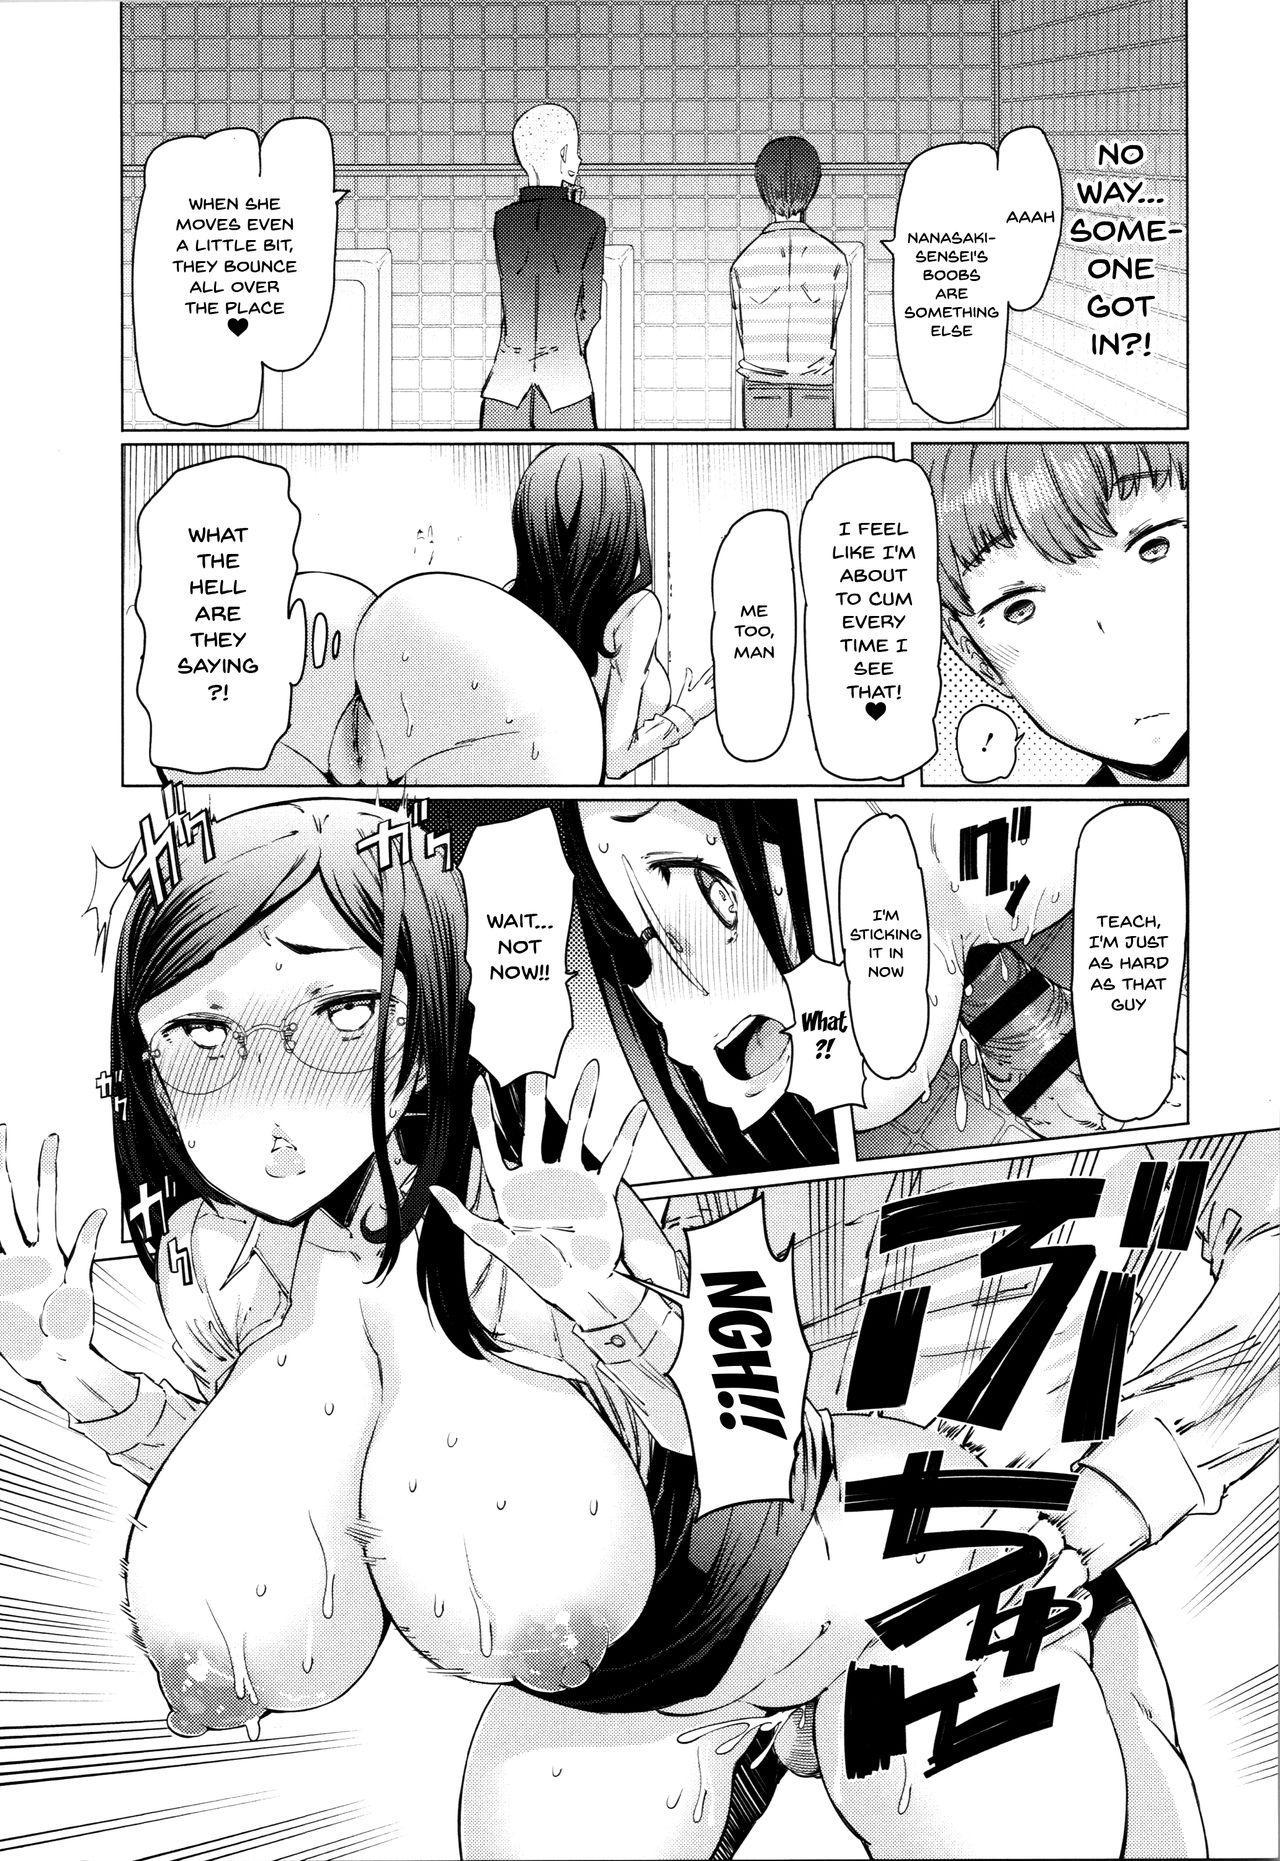 Hitozuma ga Ero Sugite Shigoto ni Naranai! | These Housewives Are Too Lewd I Can't Help It! 52